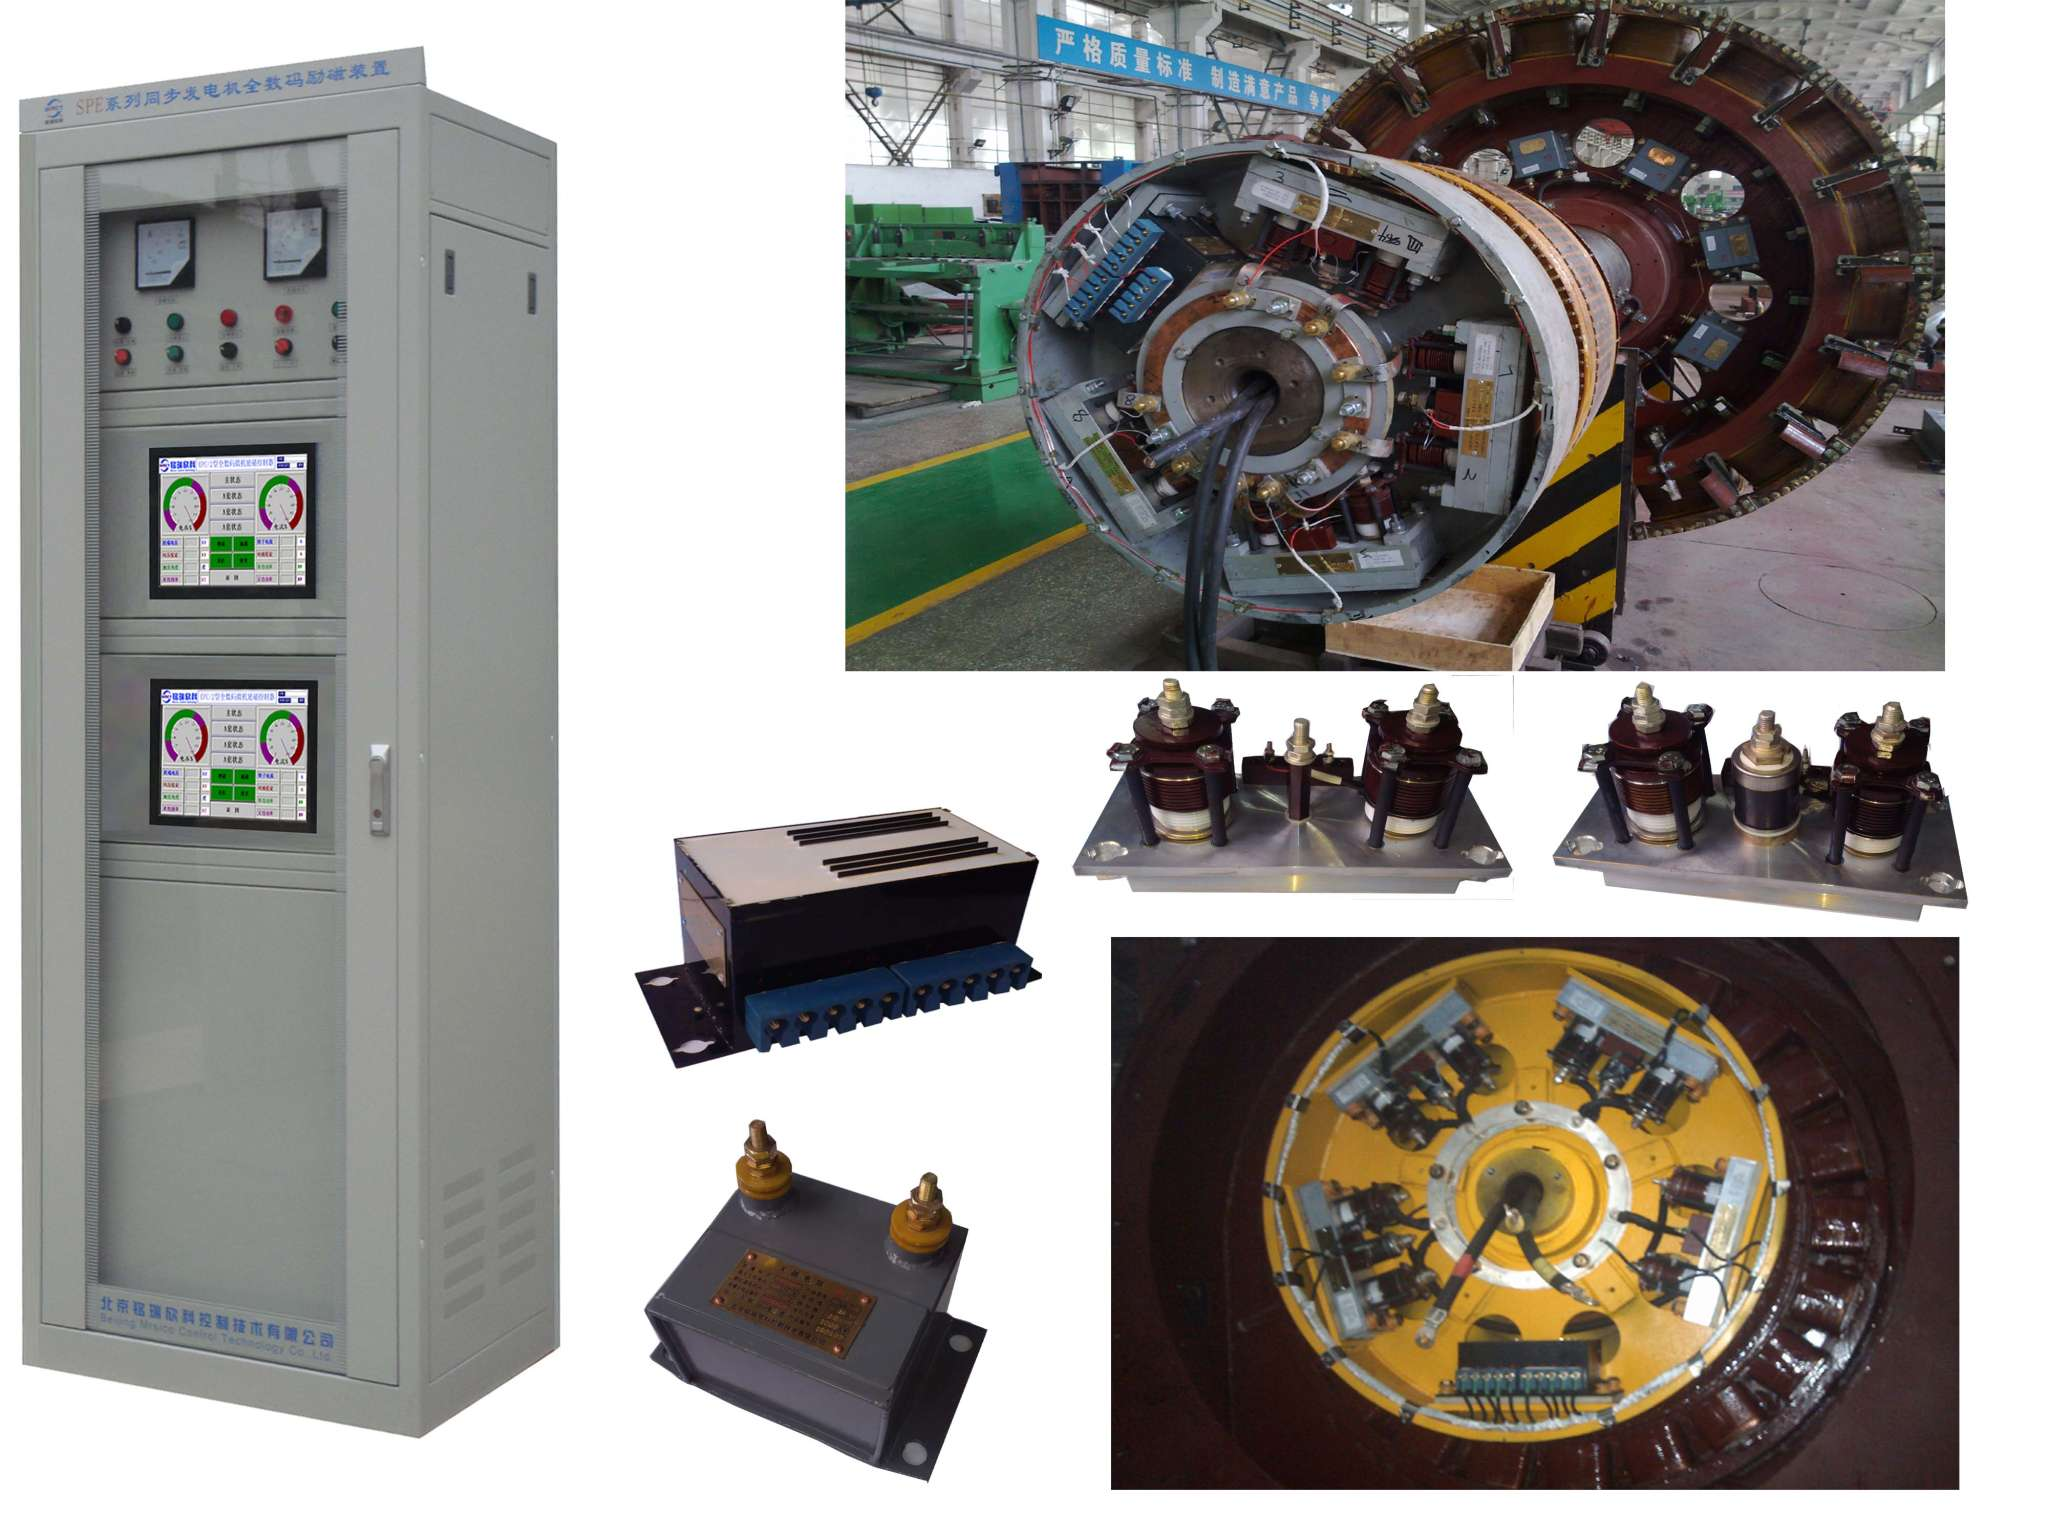 mcu型电动机励磁柜(双控单桥) 字母三(控制类型) e:励磁装置  d:直流